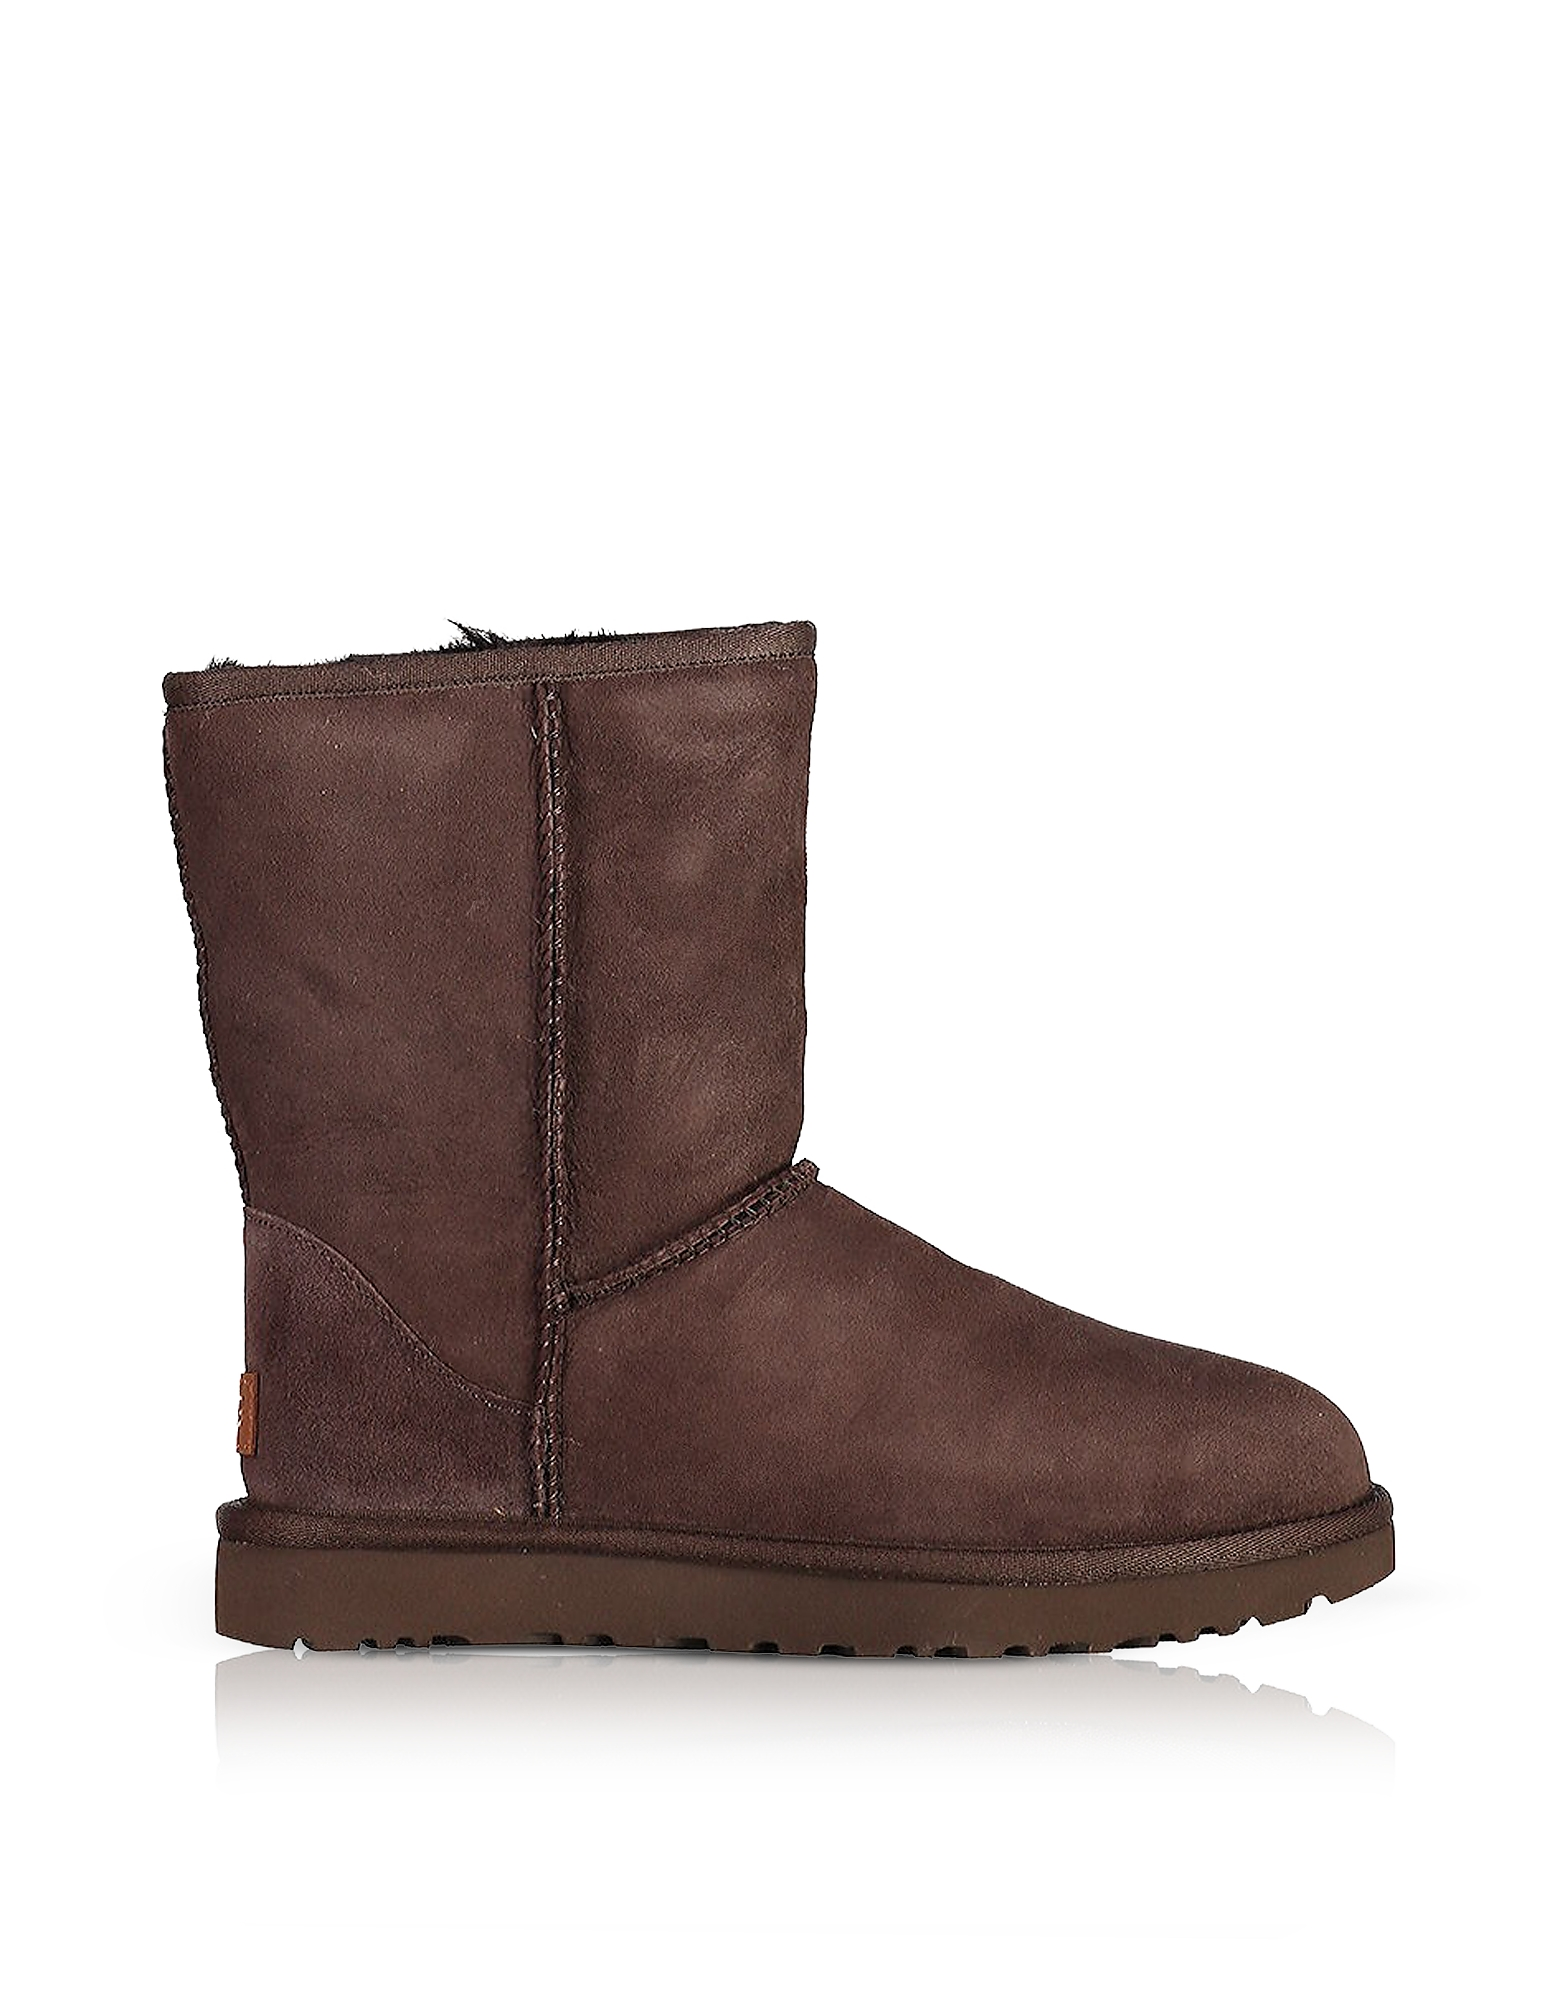 UGG Shoes, Chocolate Classic Short II Boots